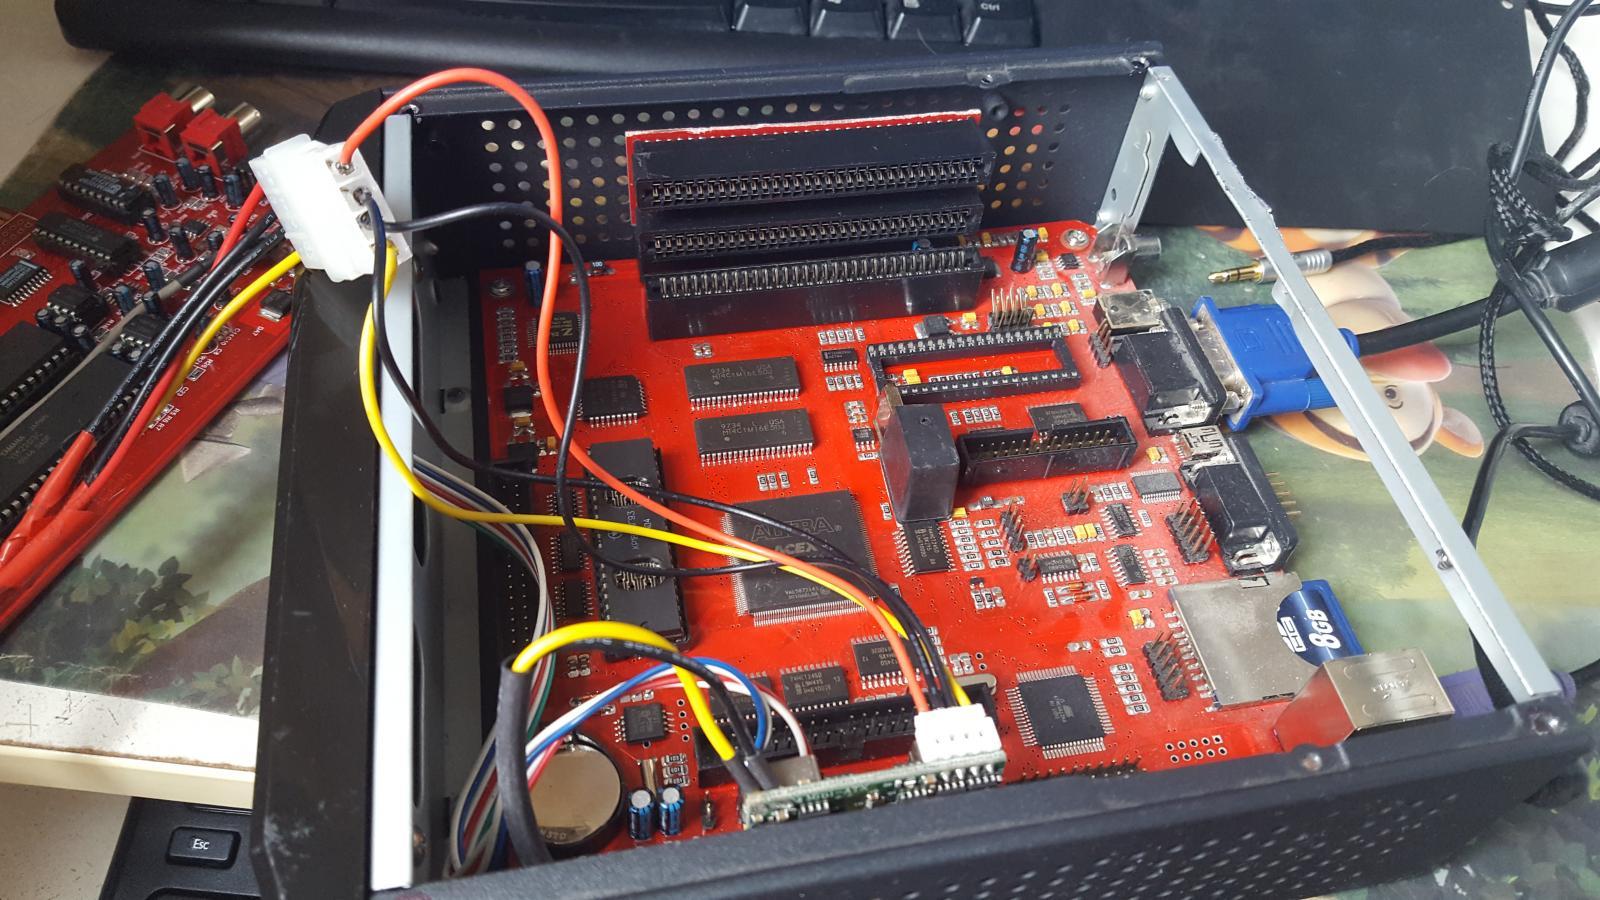 http://zxaaa.net/store/images/moddingaaanew2.jpg